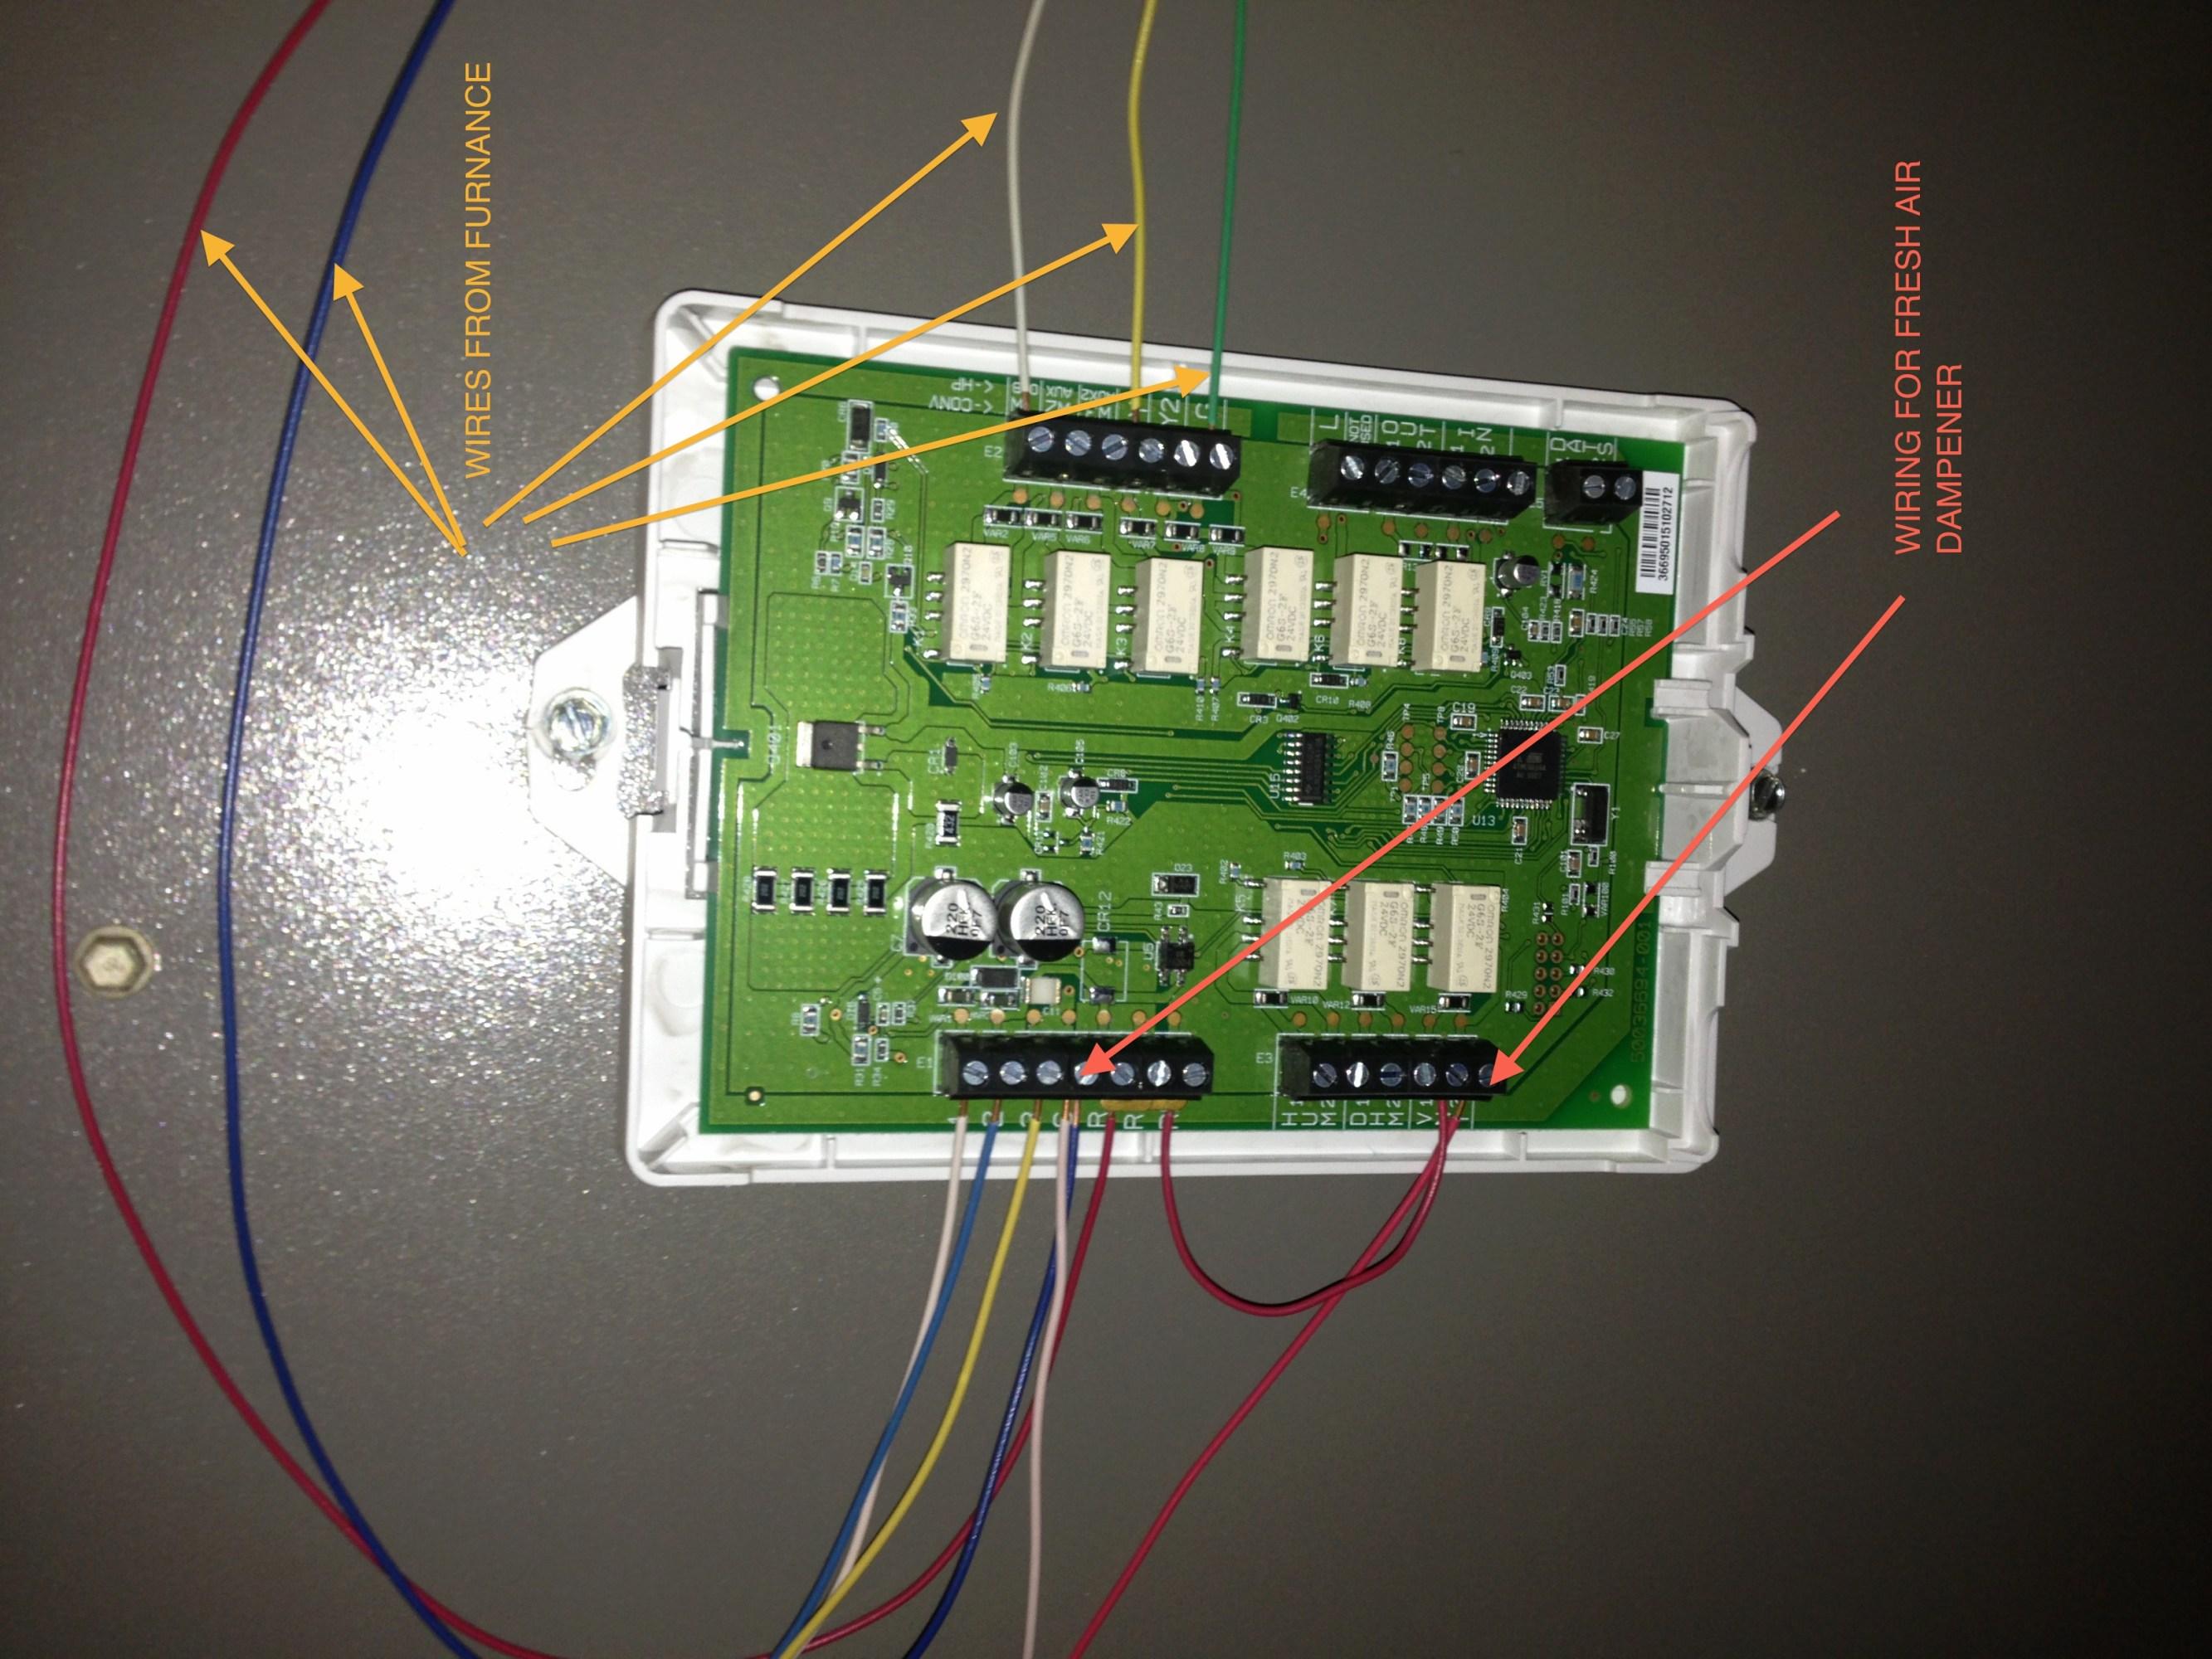 hight resolution of wiring diagram for honeywell thermostat t410 honeywell eim auto eim tec2 wiring diagram eim wiring diagram